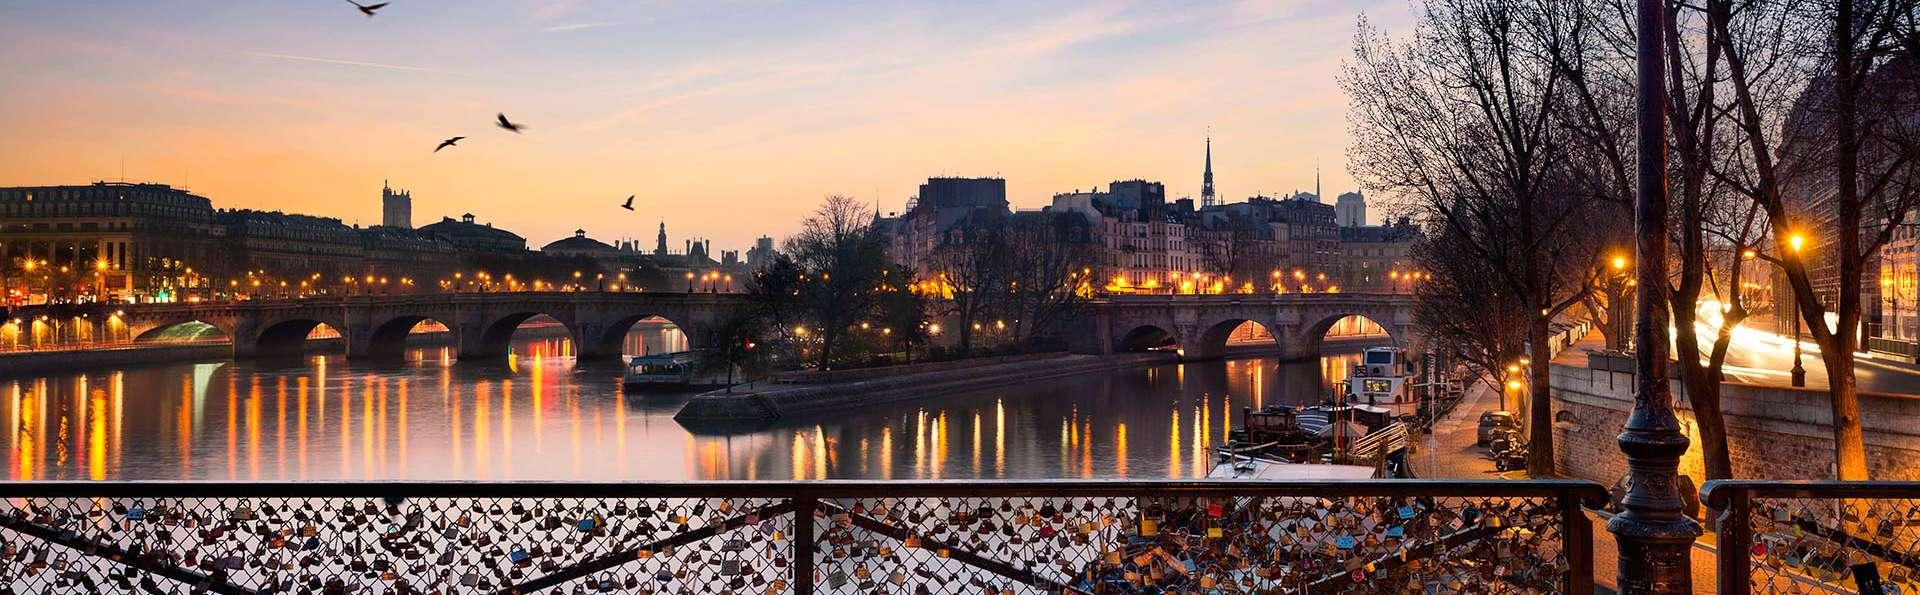 Week-end en famille près de Disneyland® Paris